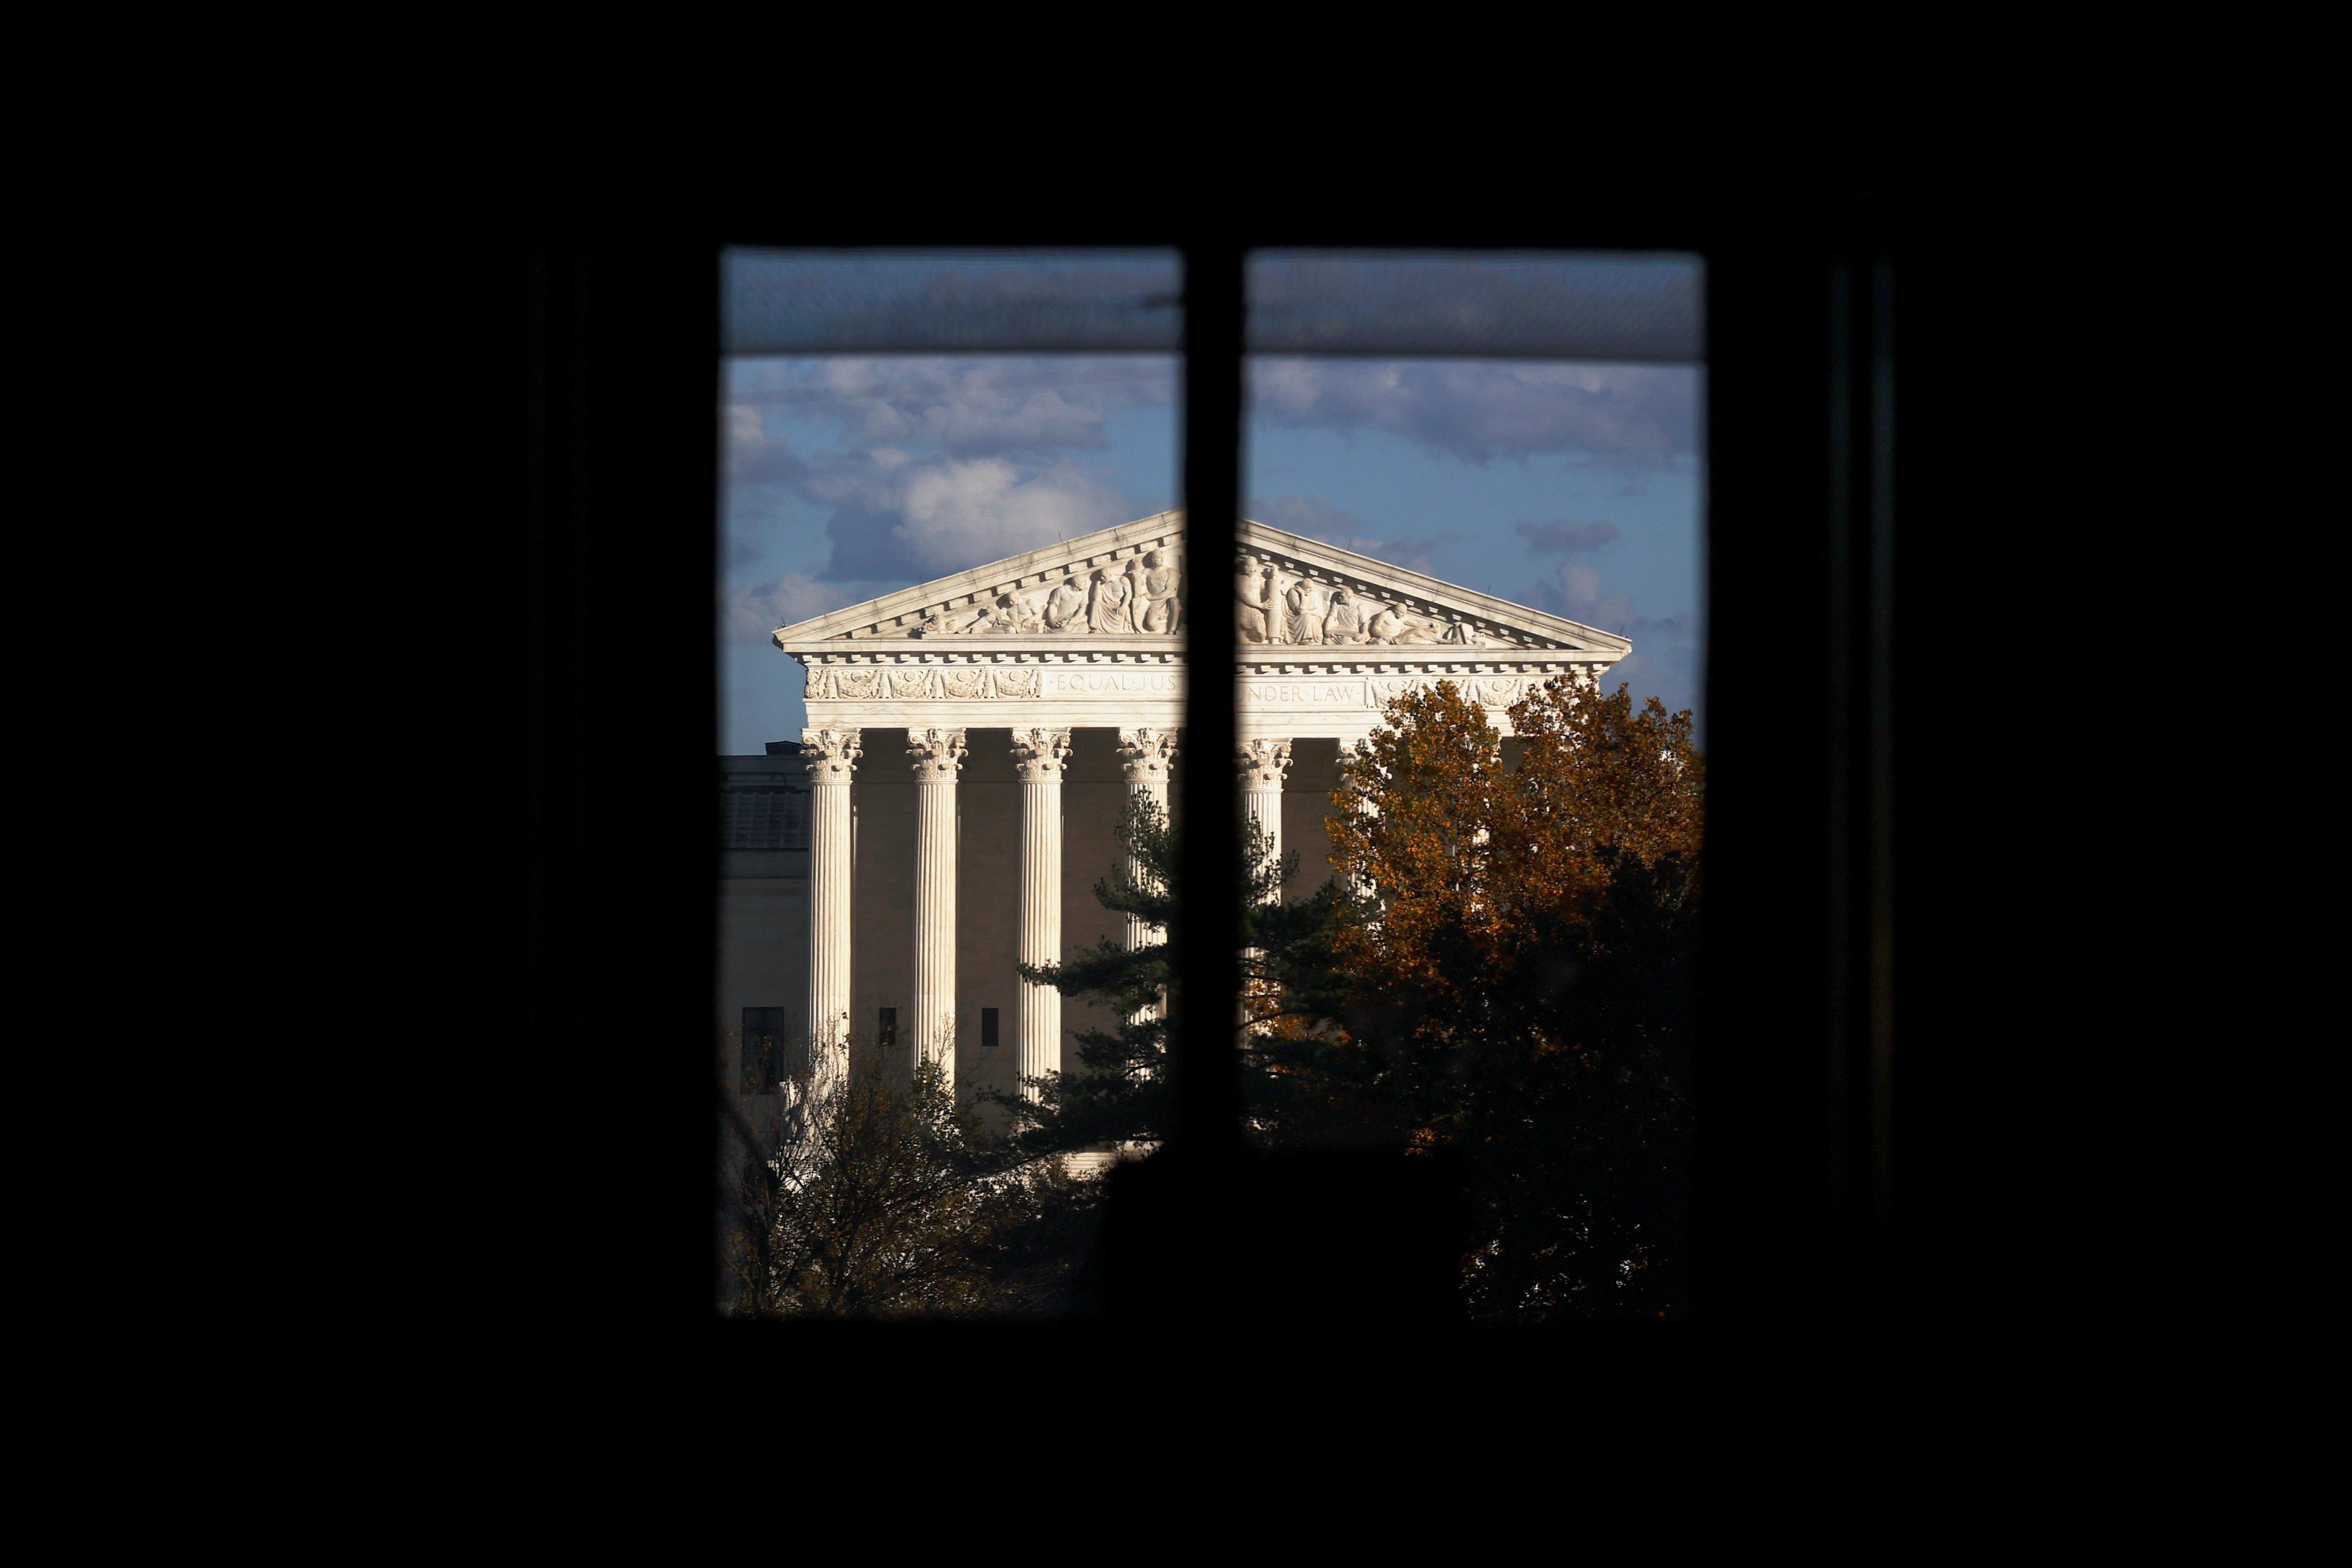 The U.S. Supreme Court building is seen behind a window in Washington, U.S. November 10, 2020. REUTERS/Hannah McKay